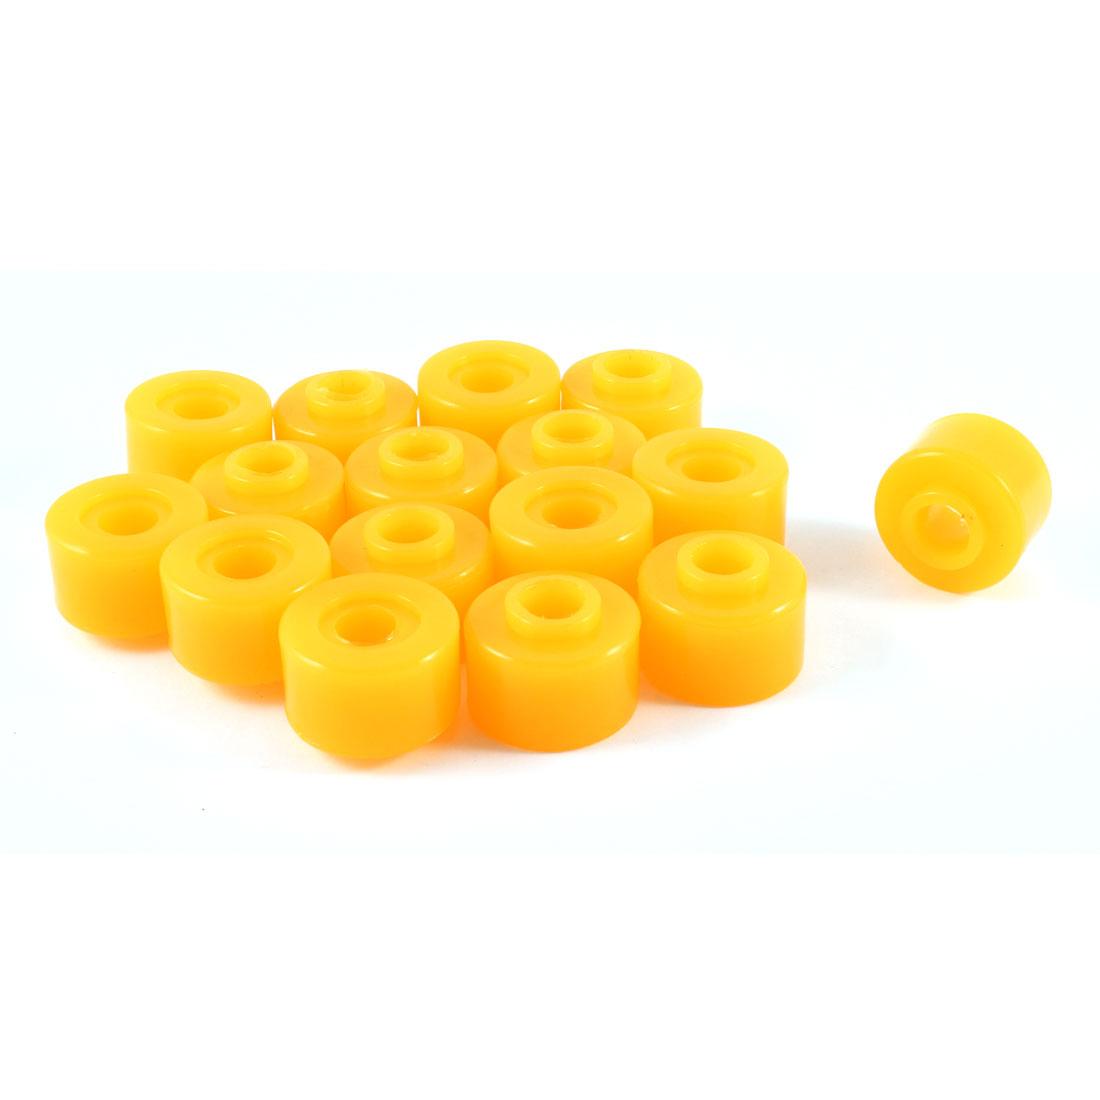 16 Pcs Cars 10mm Inside Dia Shock Absorber Bushings Damper Replacement Orange